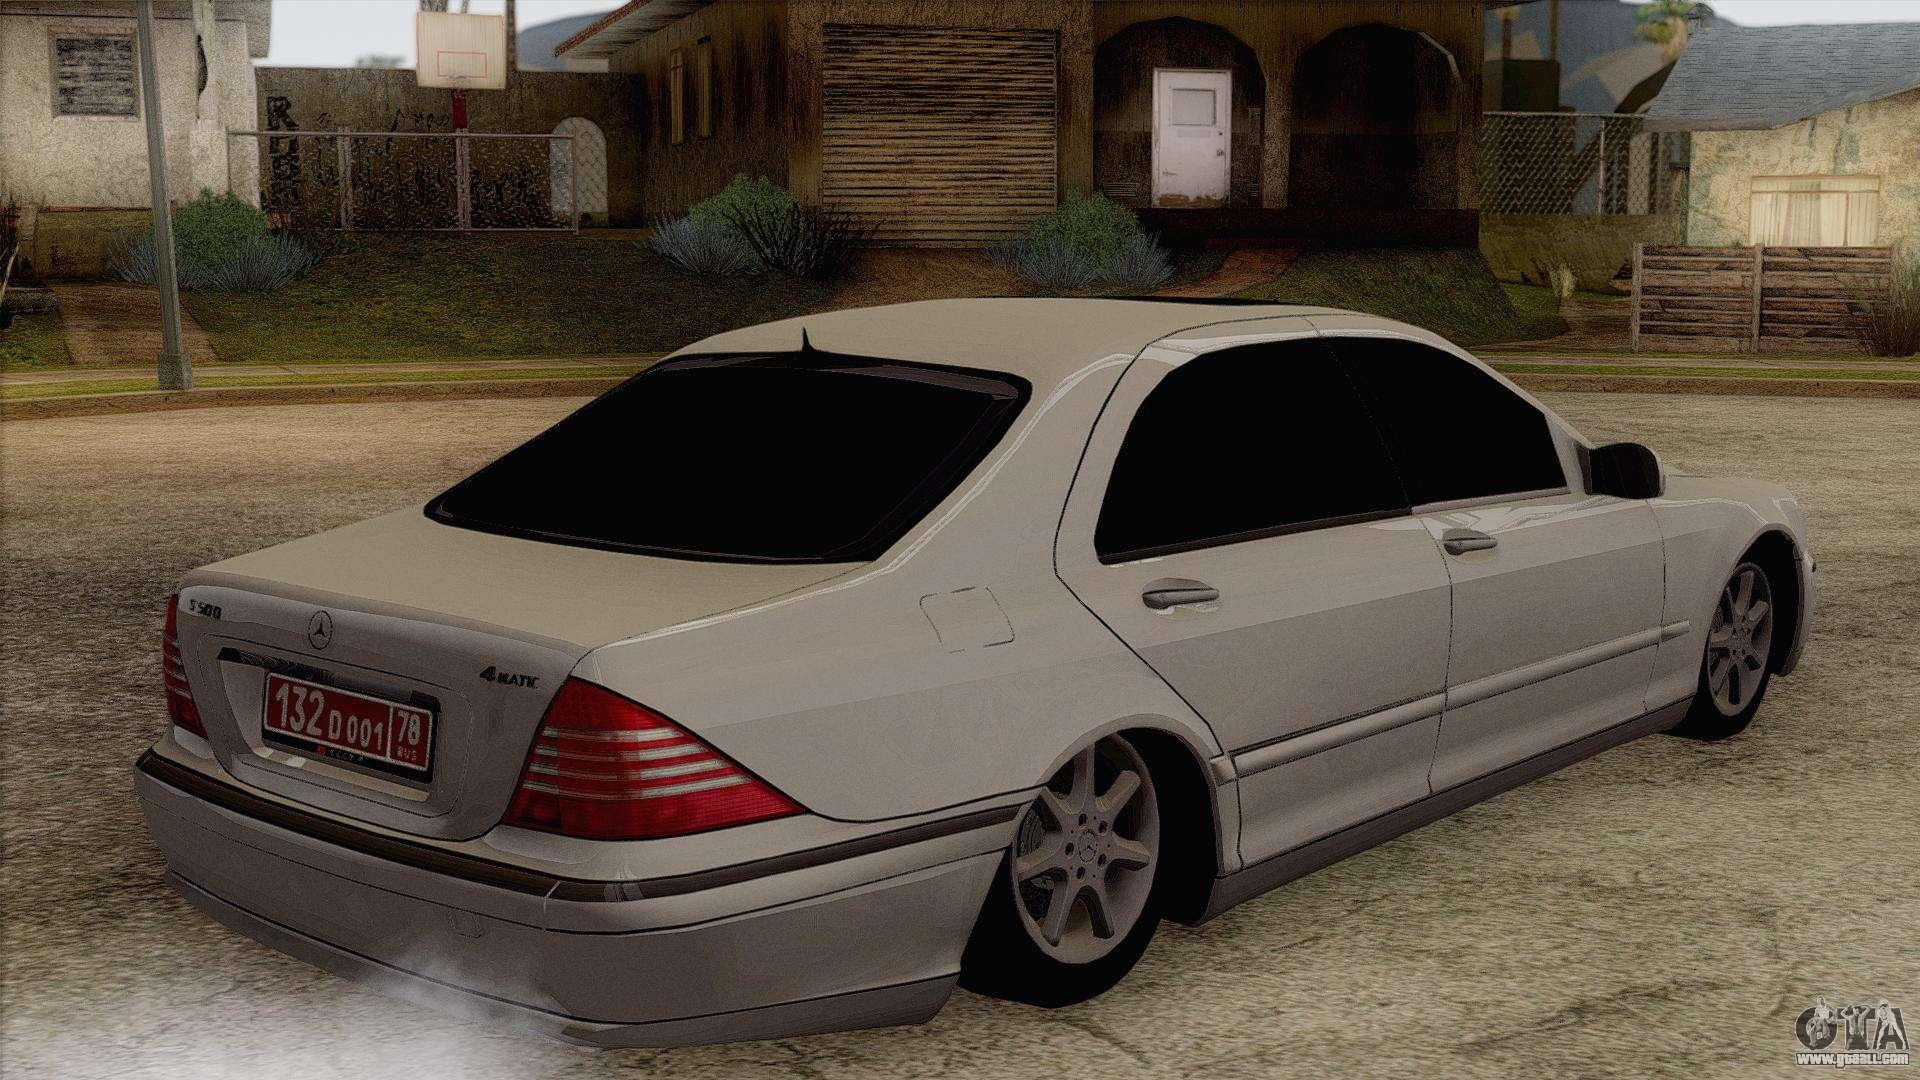 Mercedes benz w220 s500 4matic for gta san andreas for Mercedes benz s500 4matic